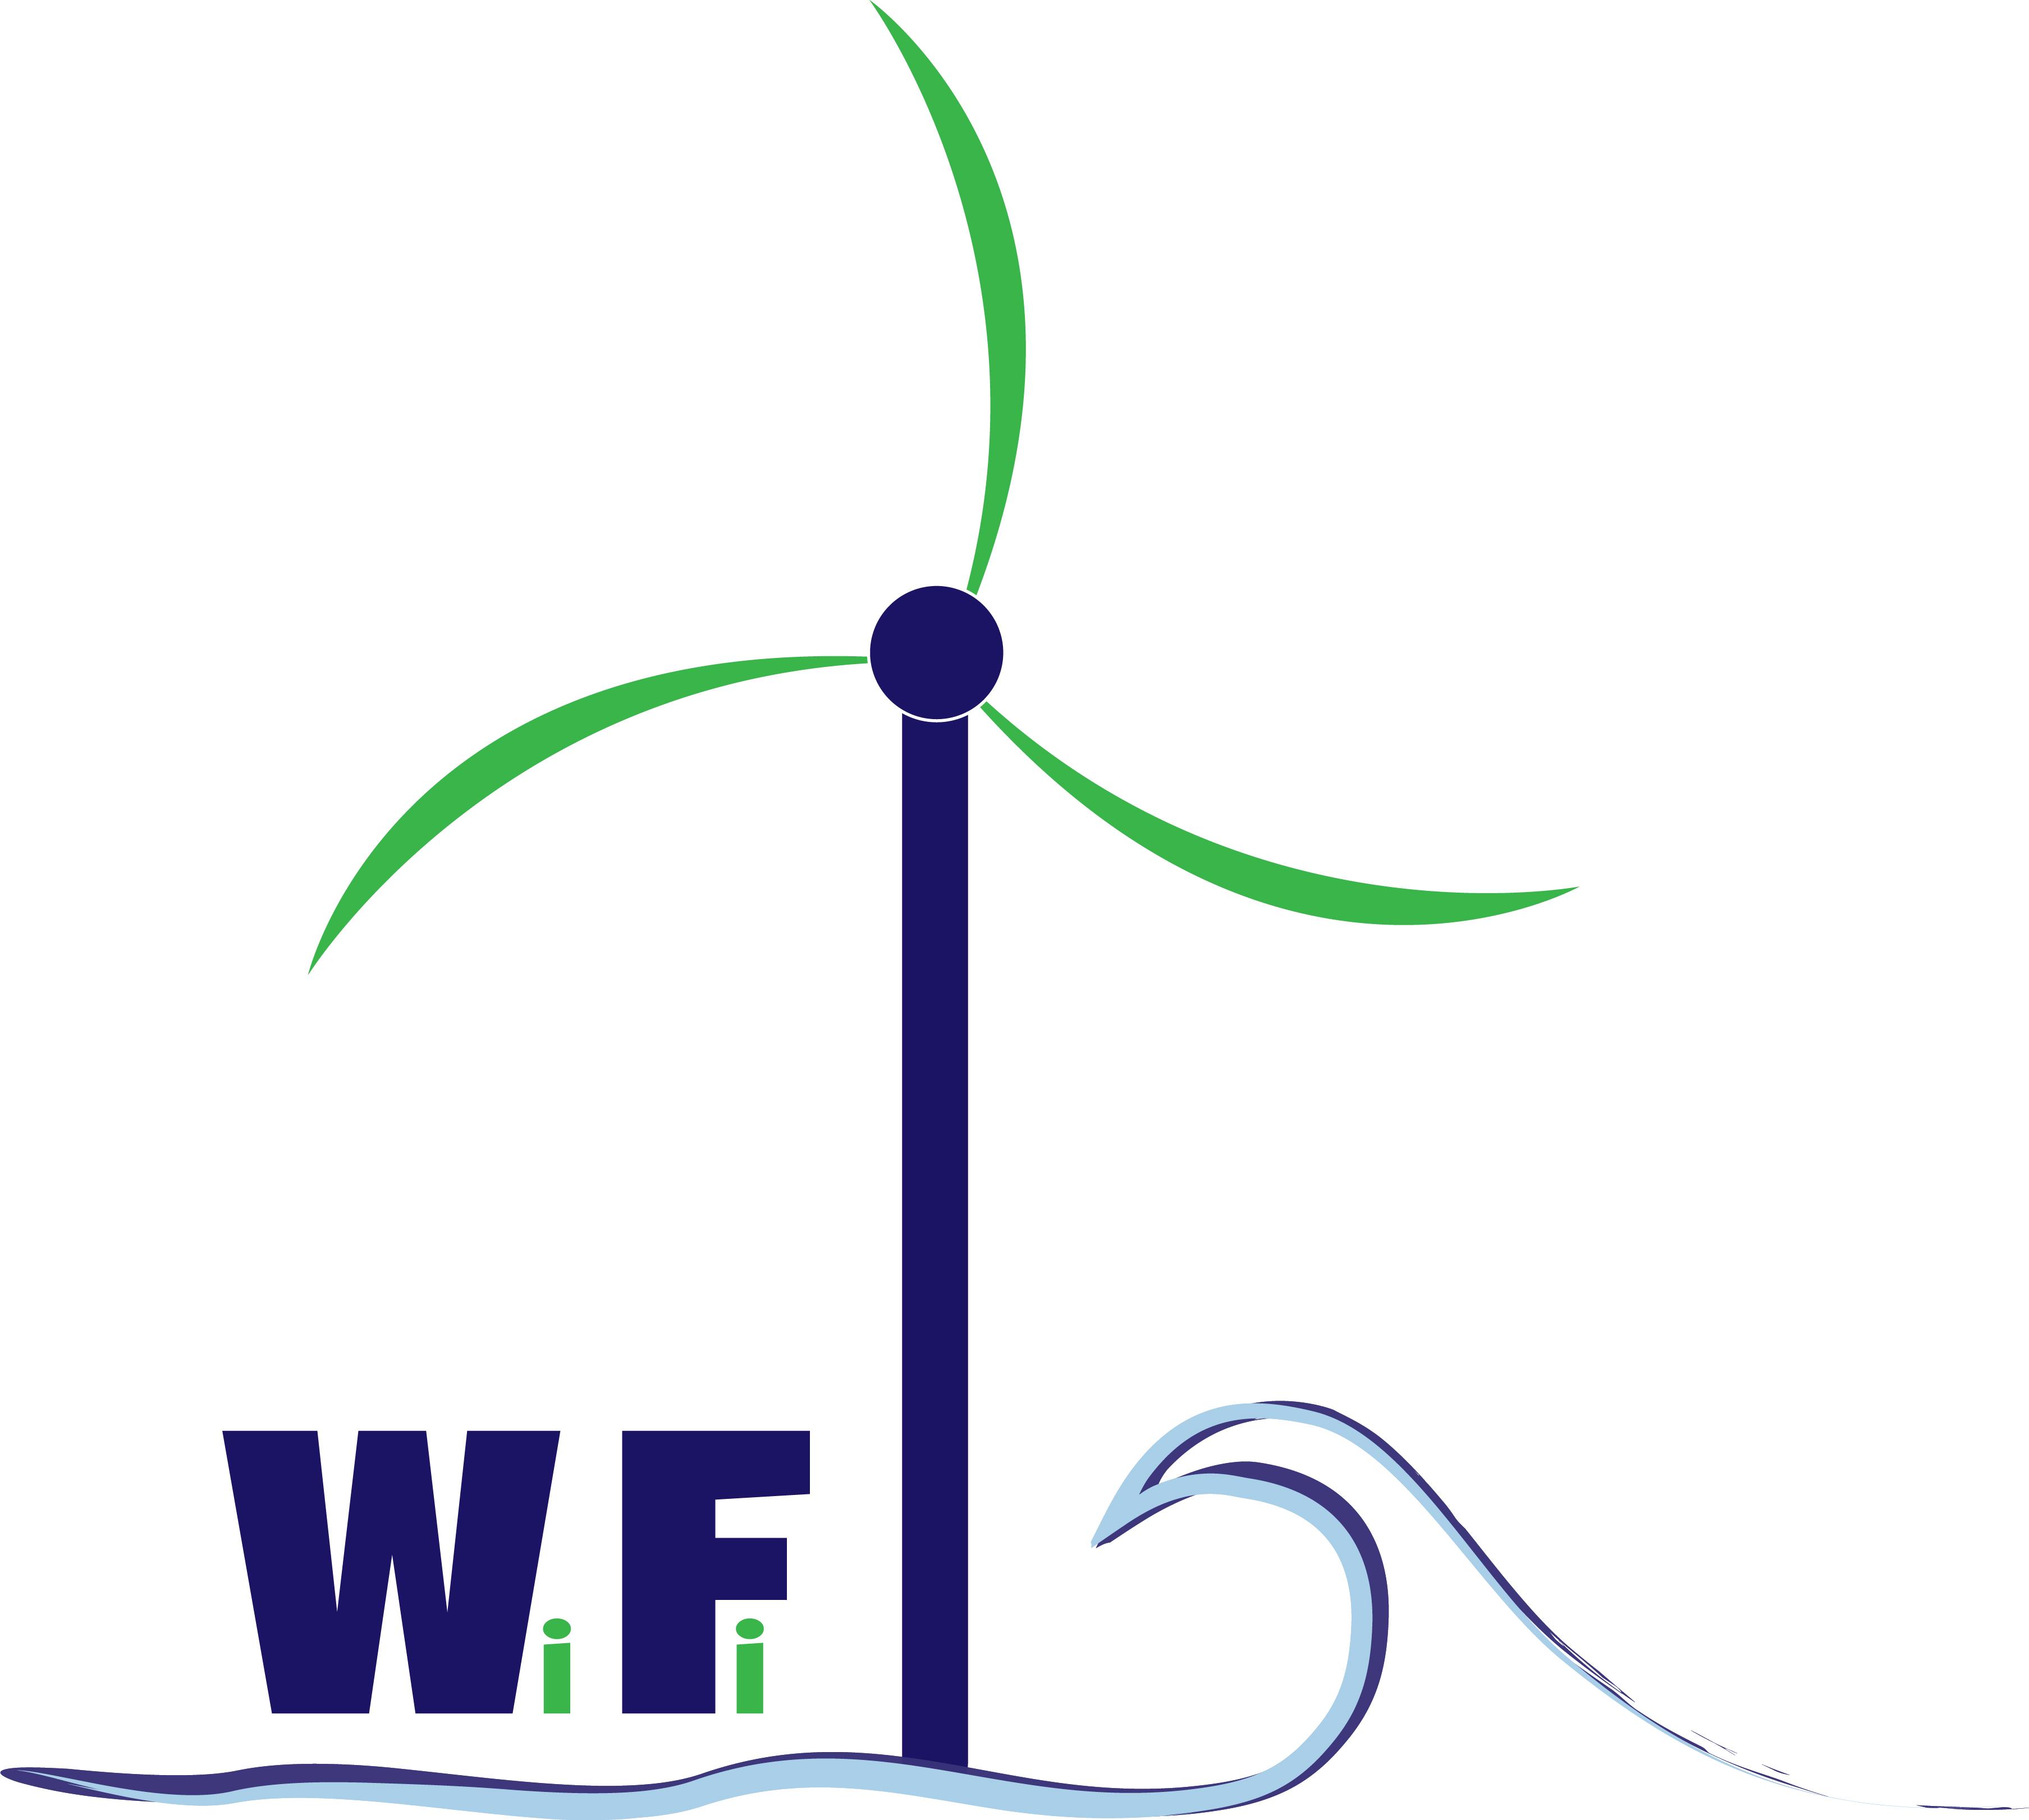 Turbine clipart wind power Turbine Download logo Wind clipart